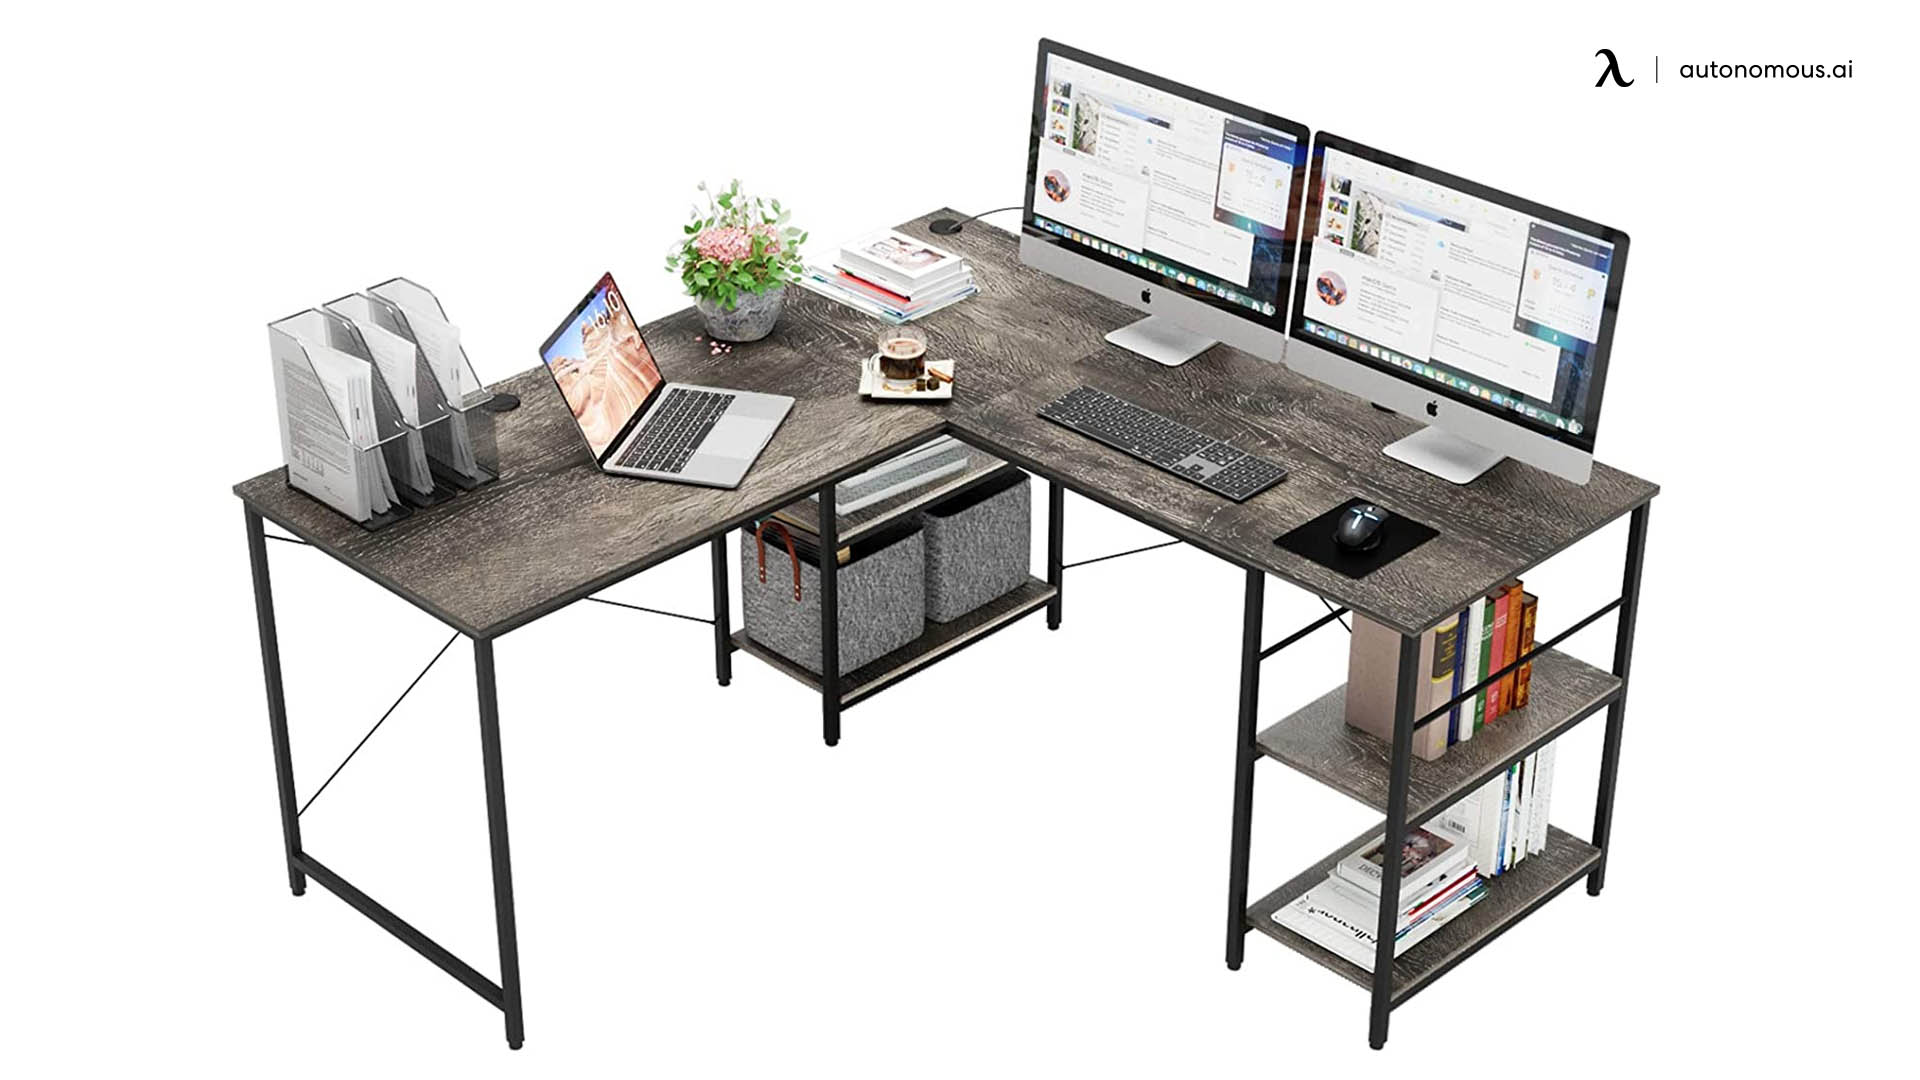 95.5-inch L-shaped computer desk from Bestier